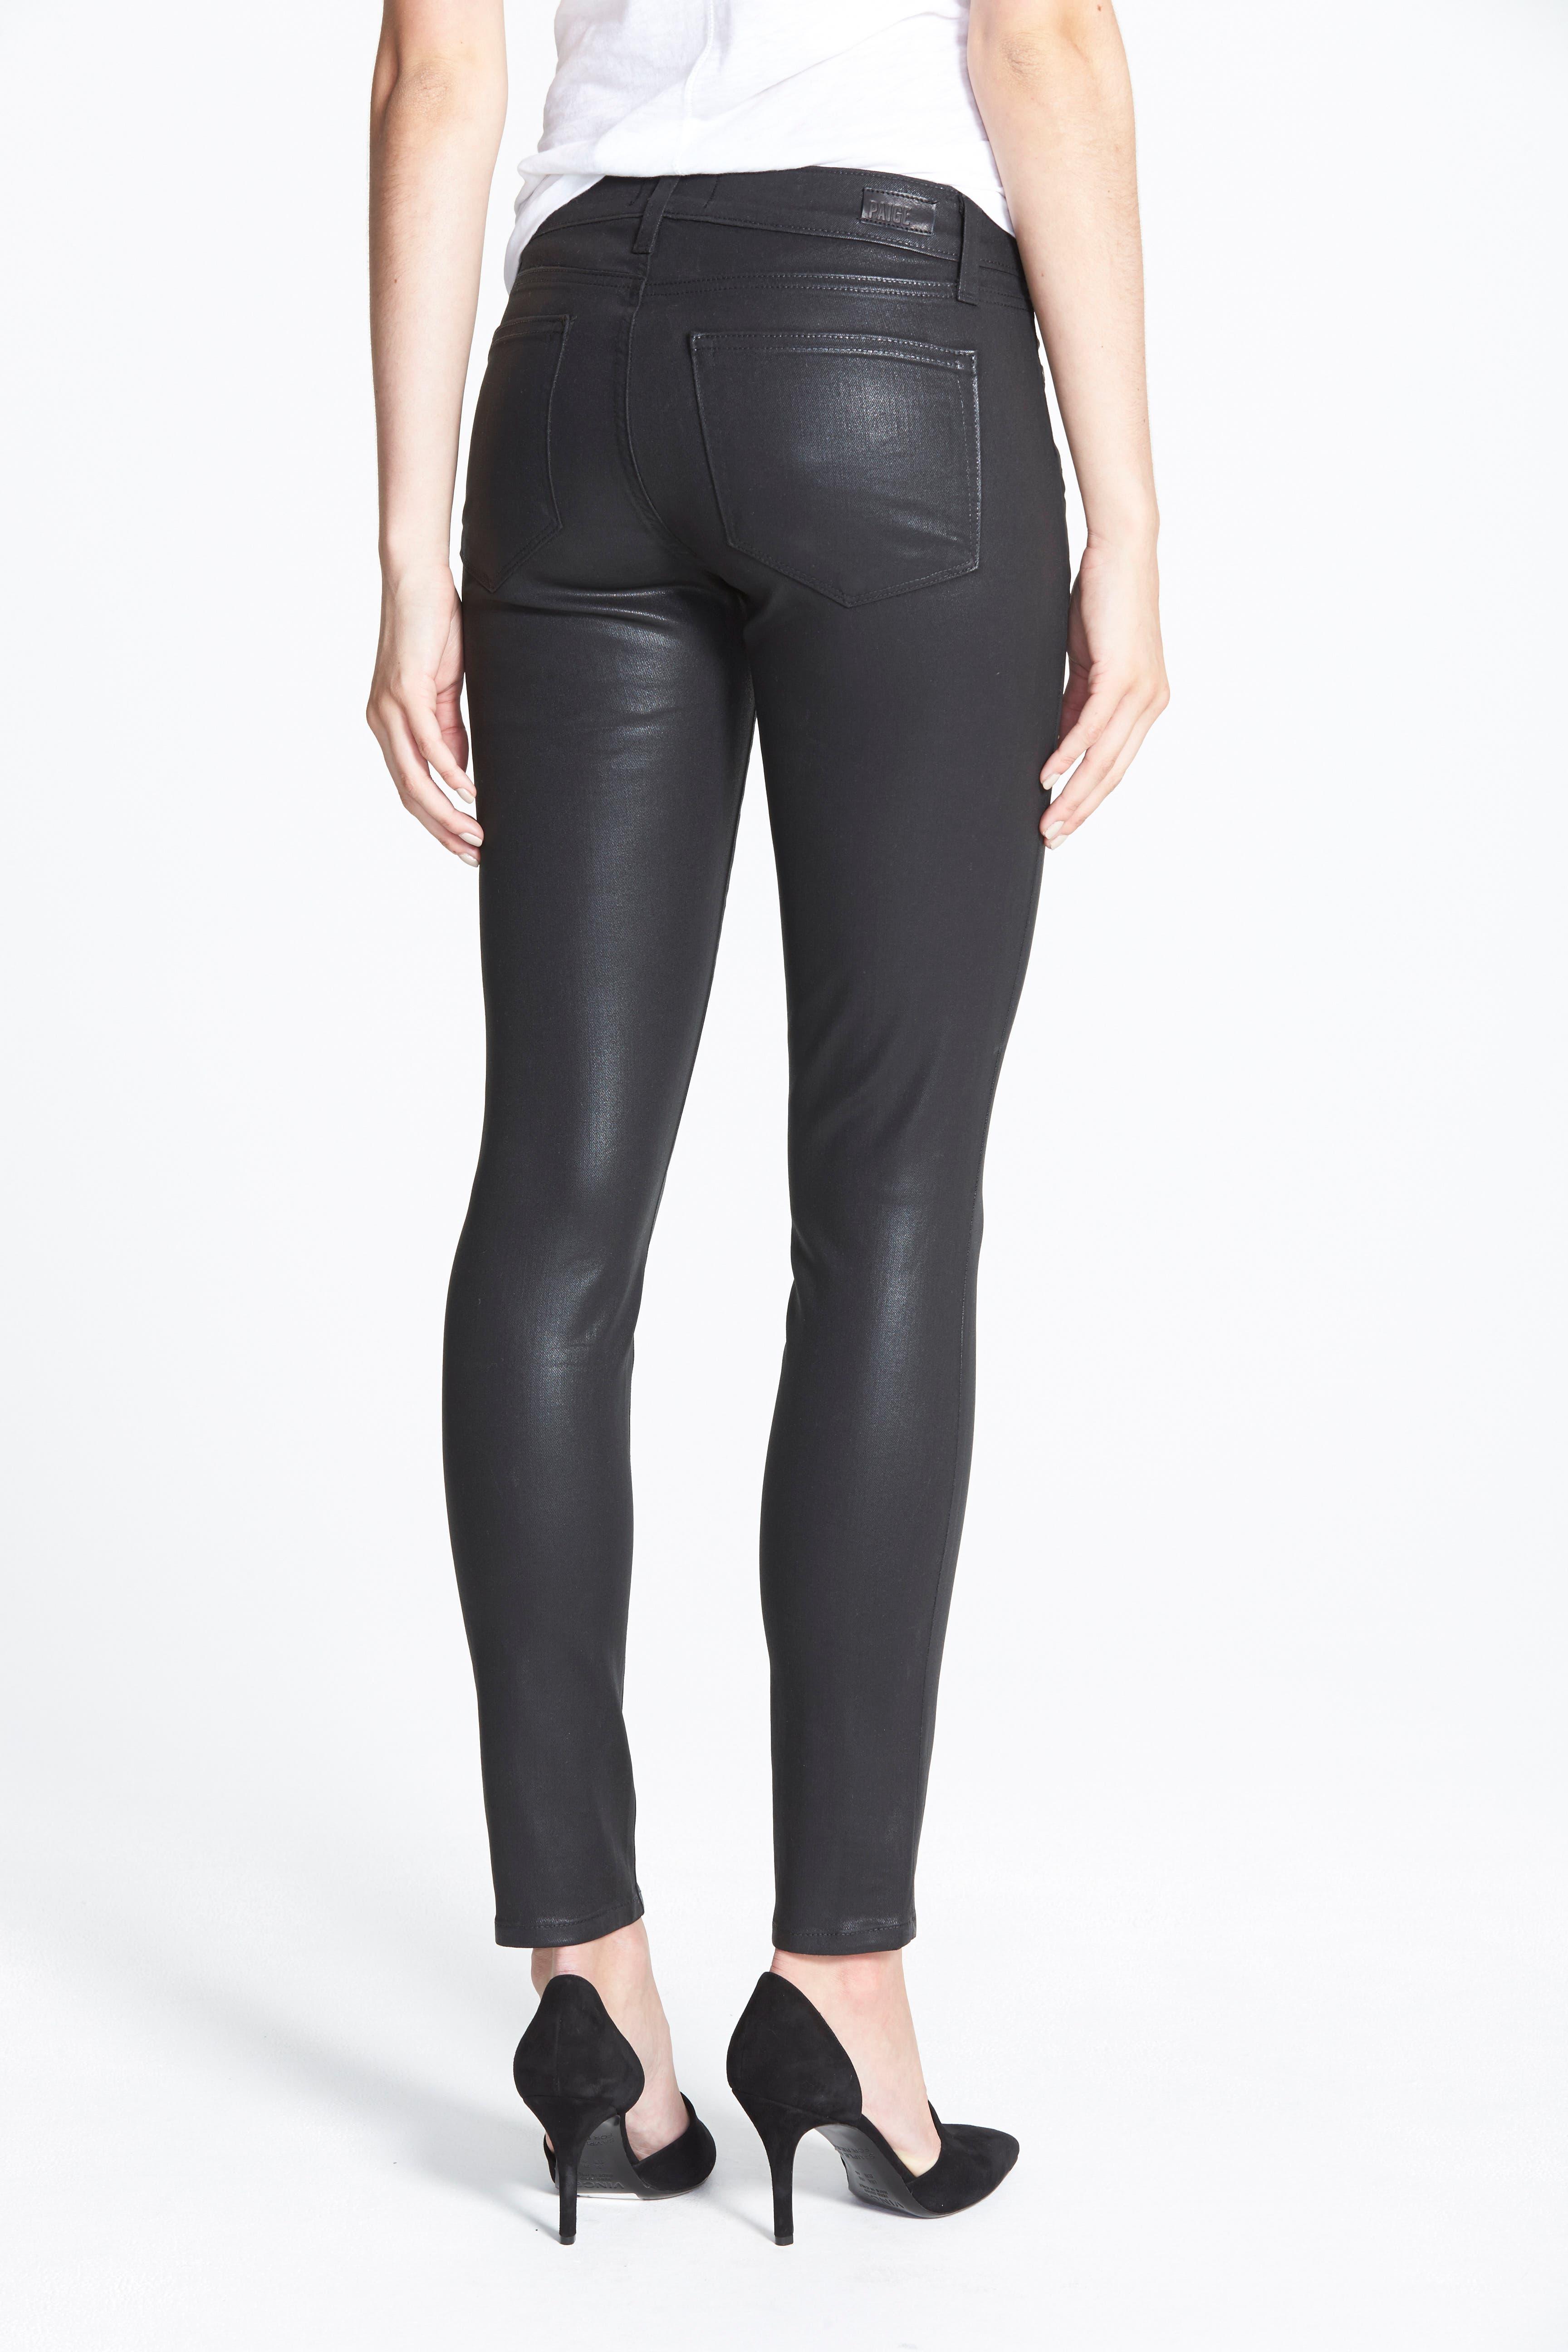 'Edgemont' Coated Ultra Skinny Jeans,                             Alternate thumbnail 3, color,                             001